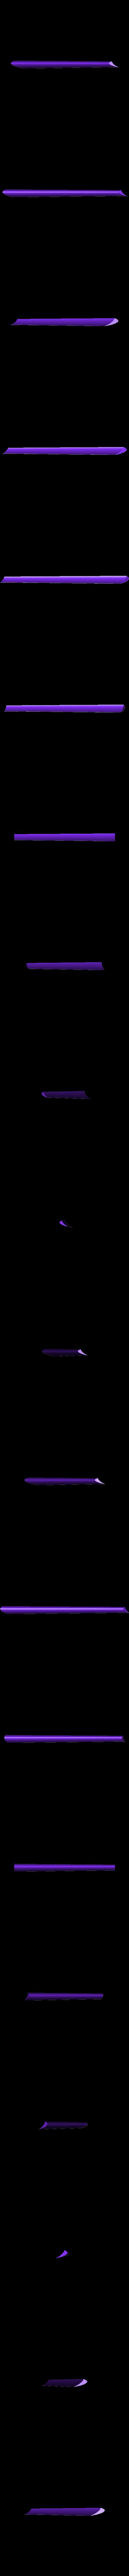 front_wing_2.stl Download free STL file Leading-Edge Slats for Horten Wing Stiletto • 3D printer model, wersy